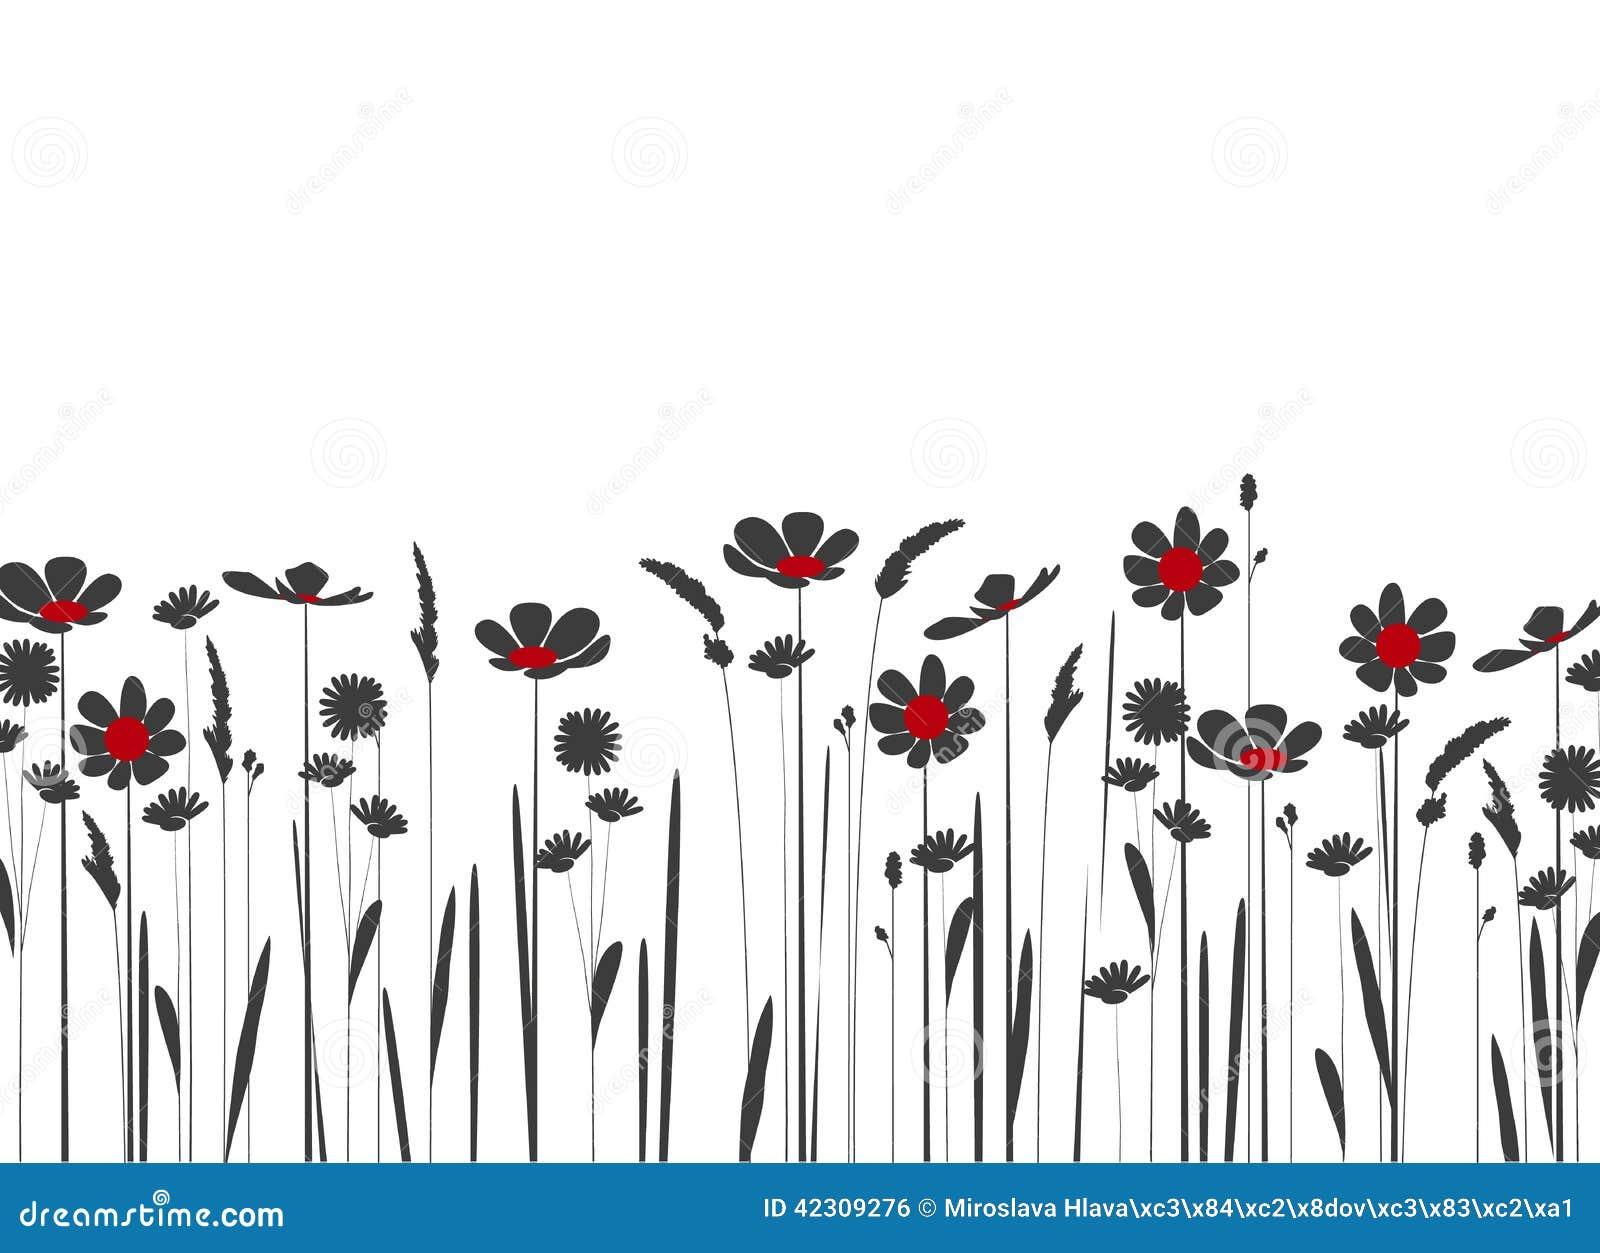 Wildflowers Stock Vector - Image: 42309276